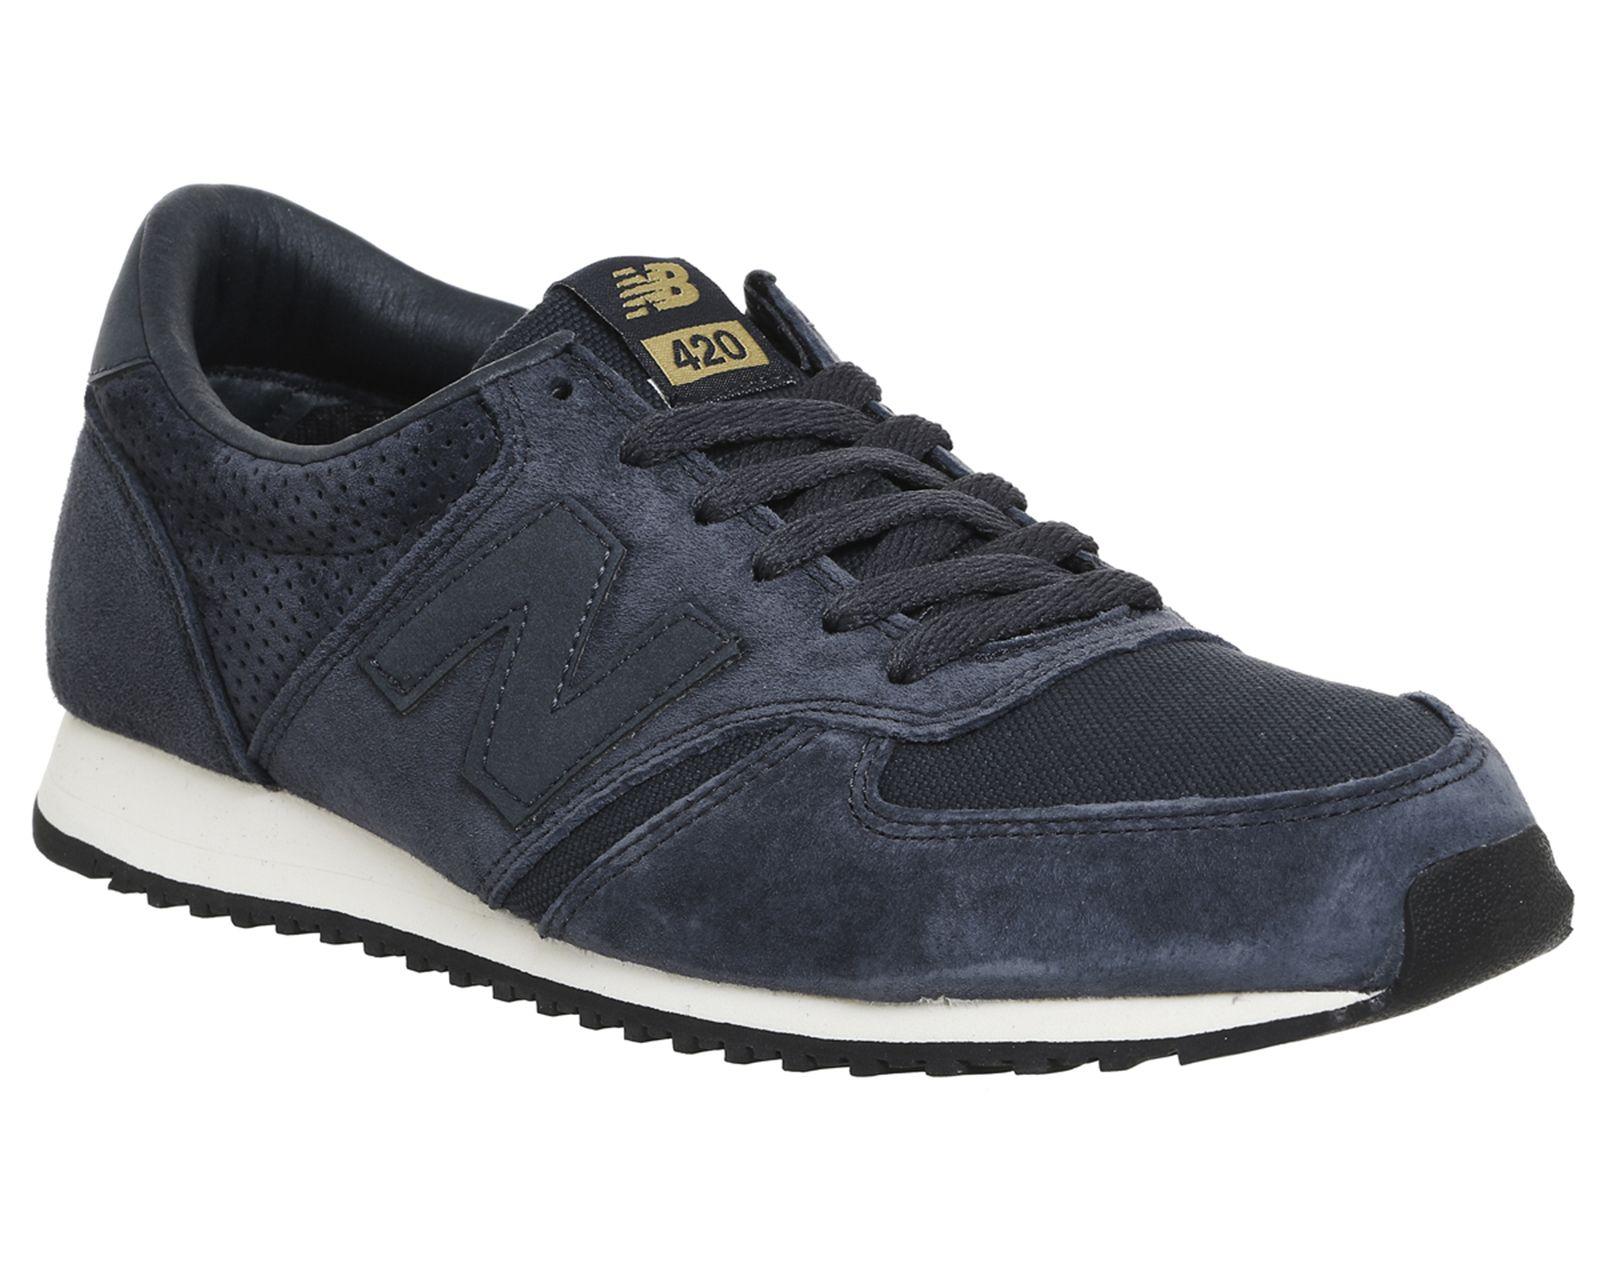 U420 Shoes X Balance New Pinterest Gold Footwear Navy pYw5FxC1Fq